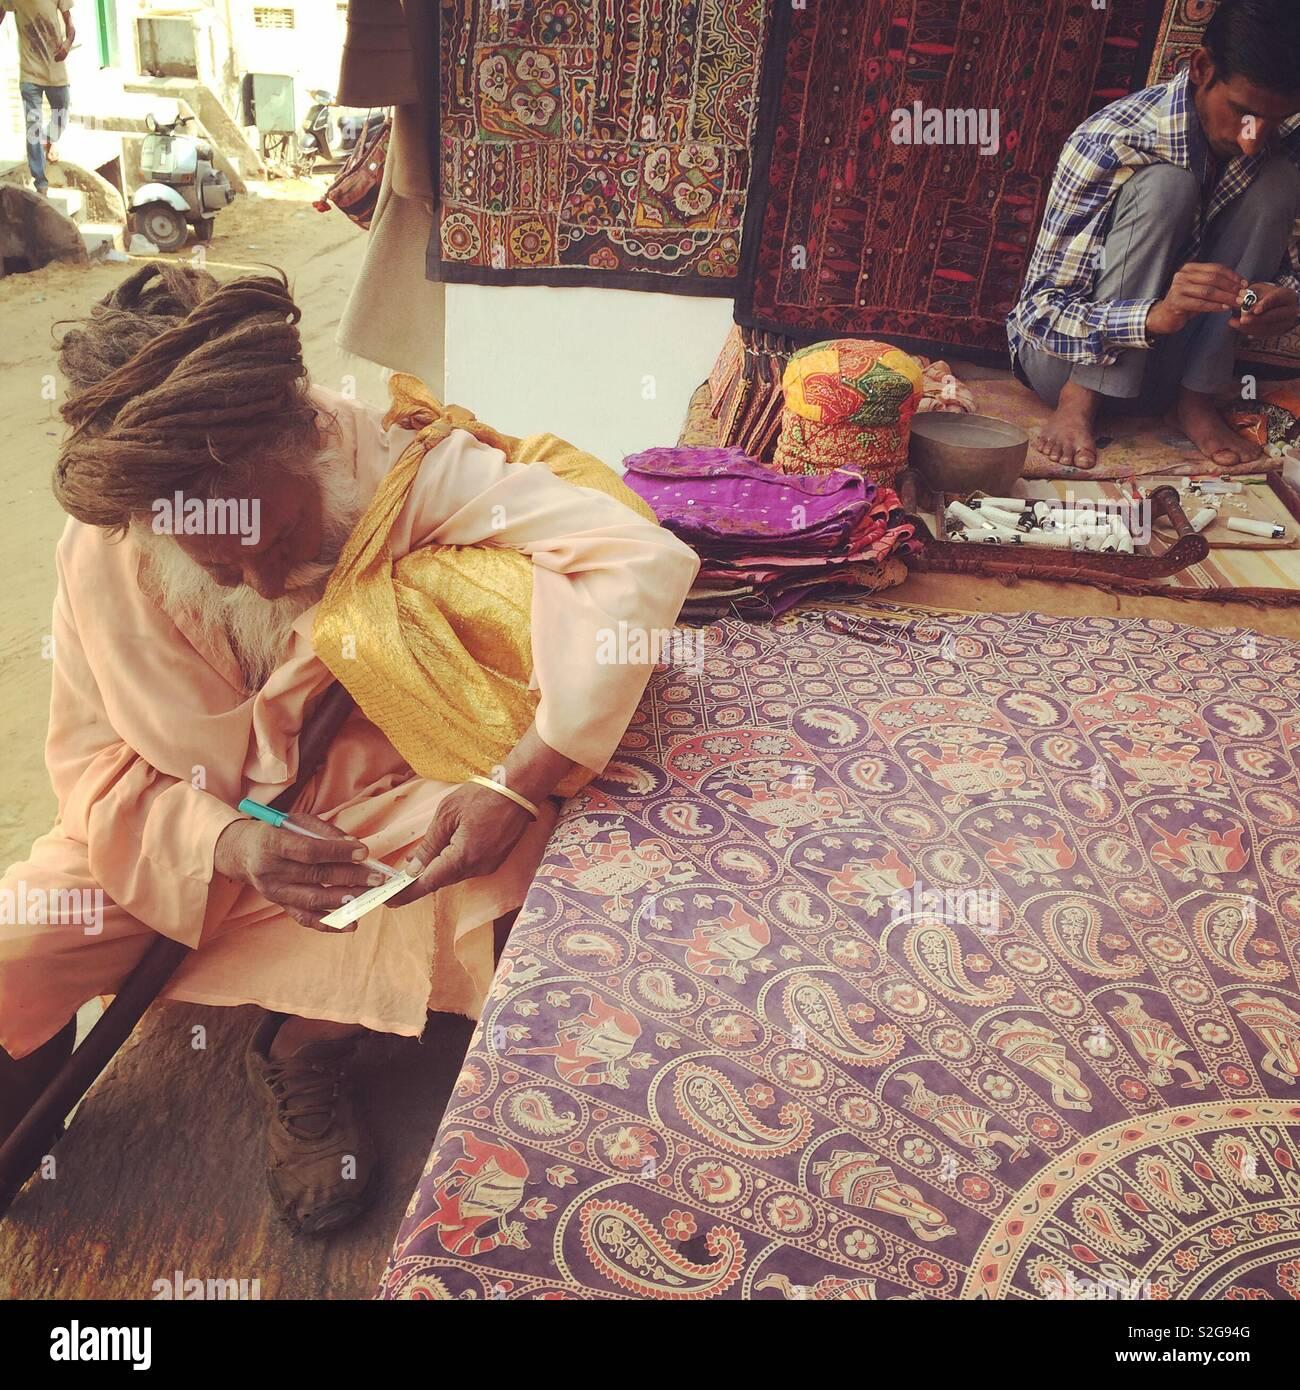 Sadhu in Pushkar with jewelry seller - Stock Image